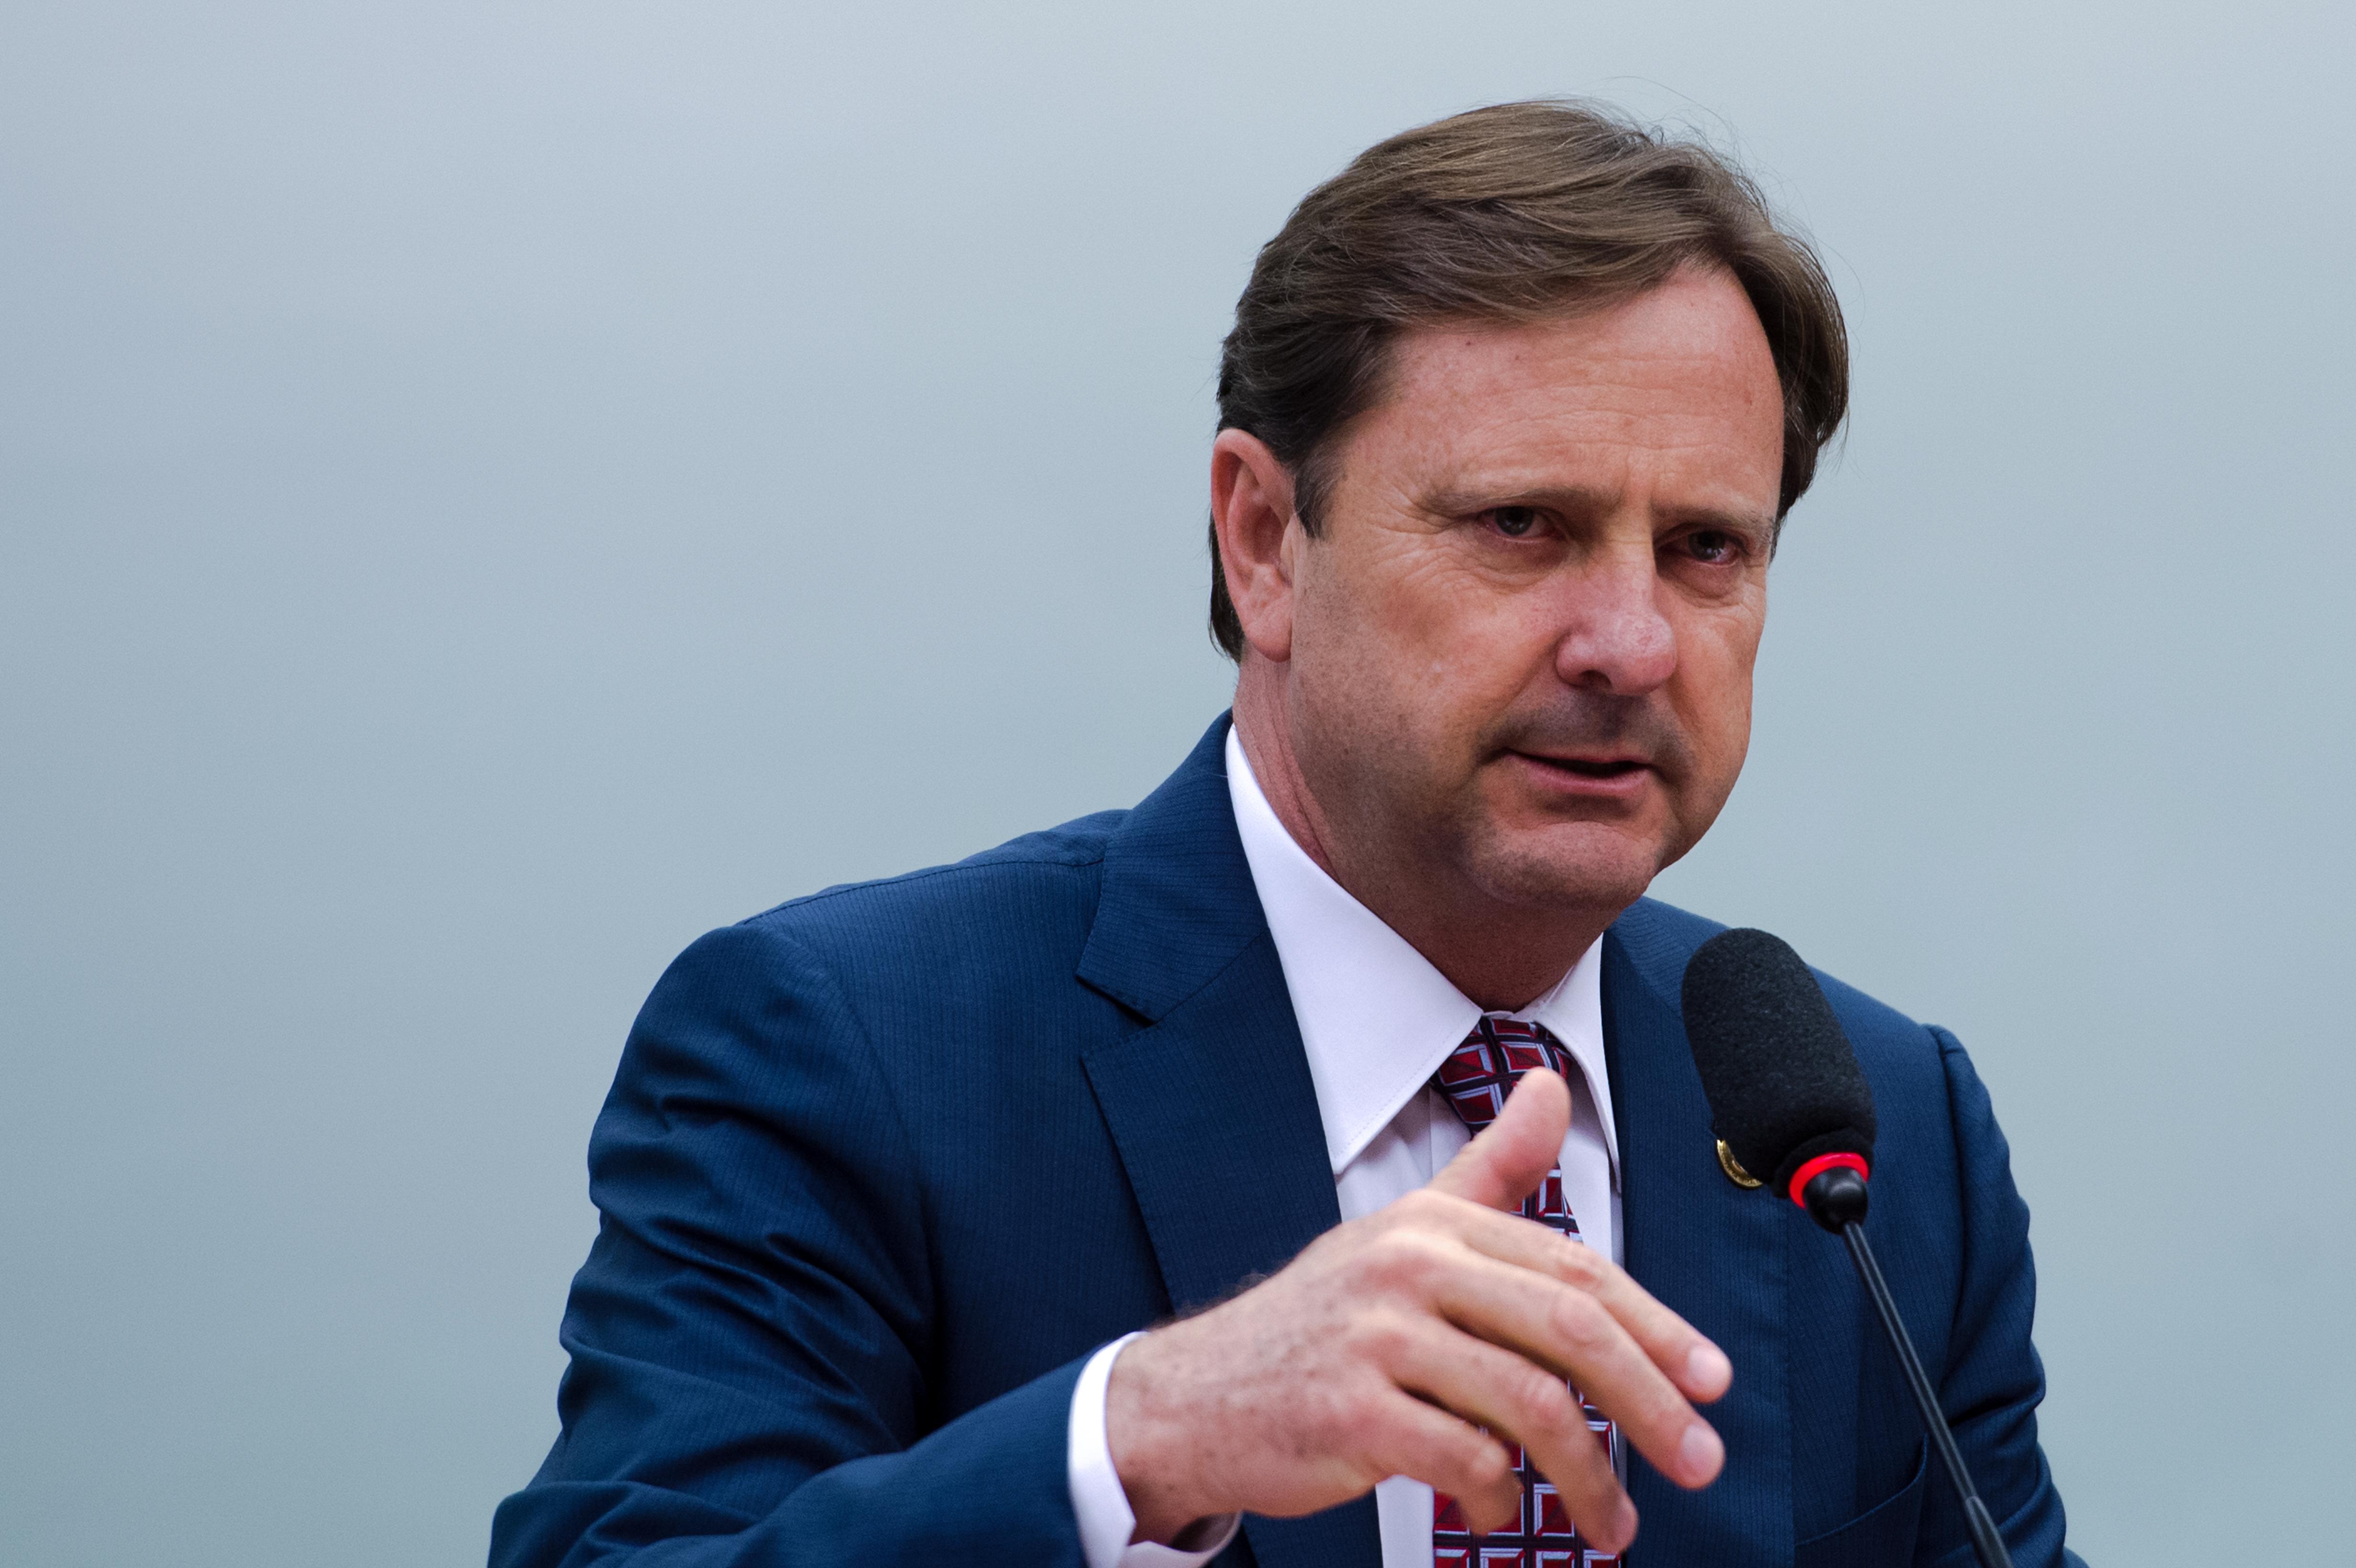 Brasilia O Relator Senador Acir Gurgacz Durante Entrega Seu Parecer Sobre Pedido Do